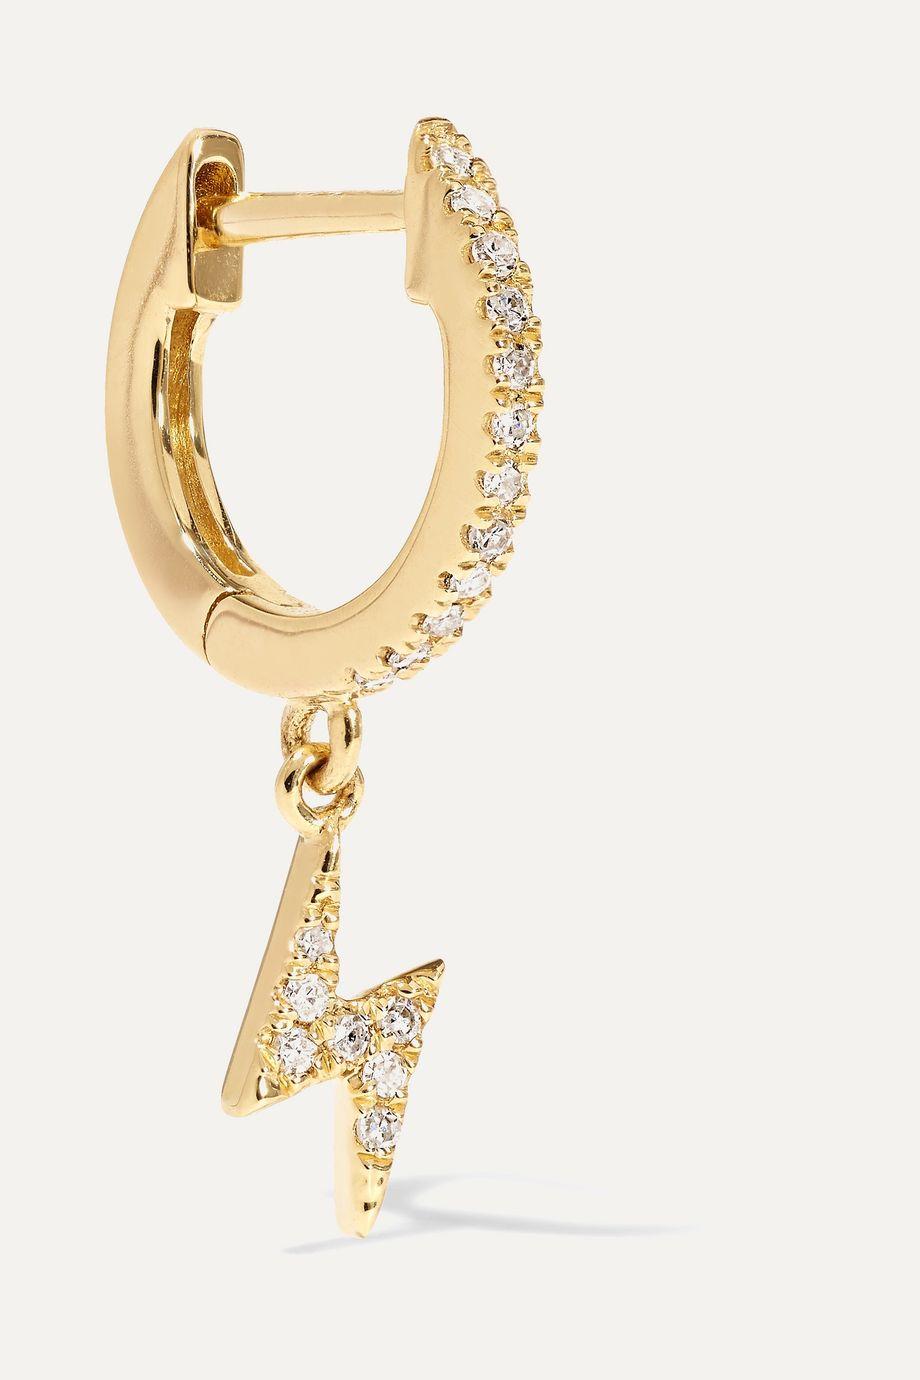 STONE AND STRAND 14-karat gold diamond hoop earring